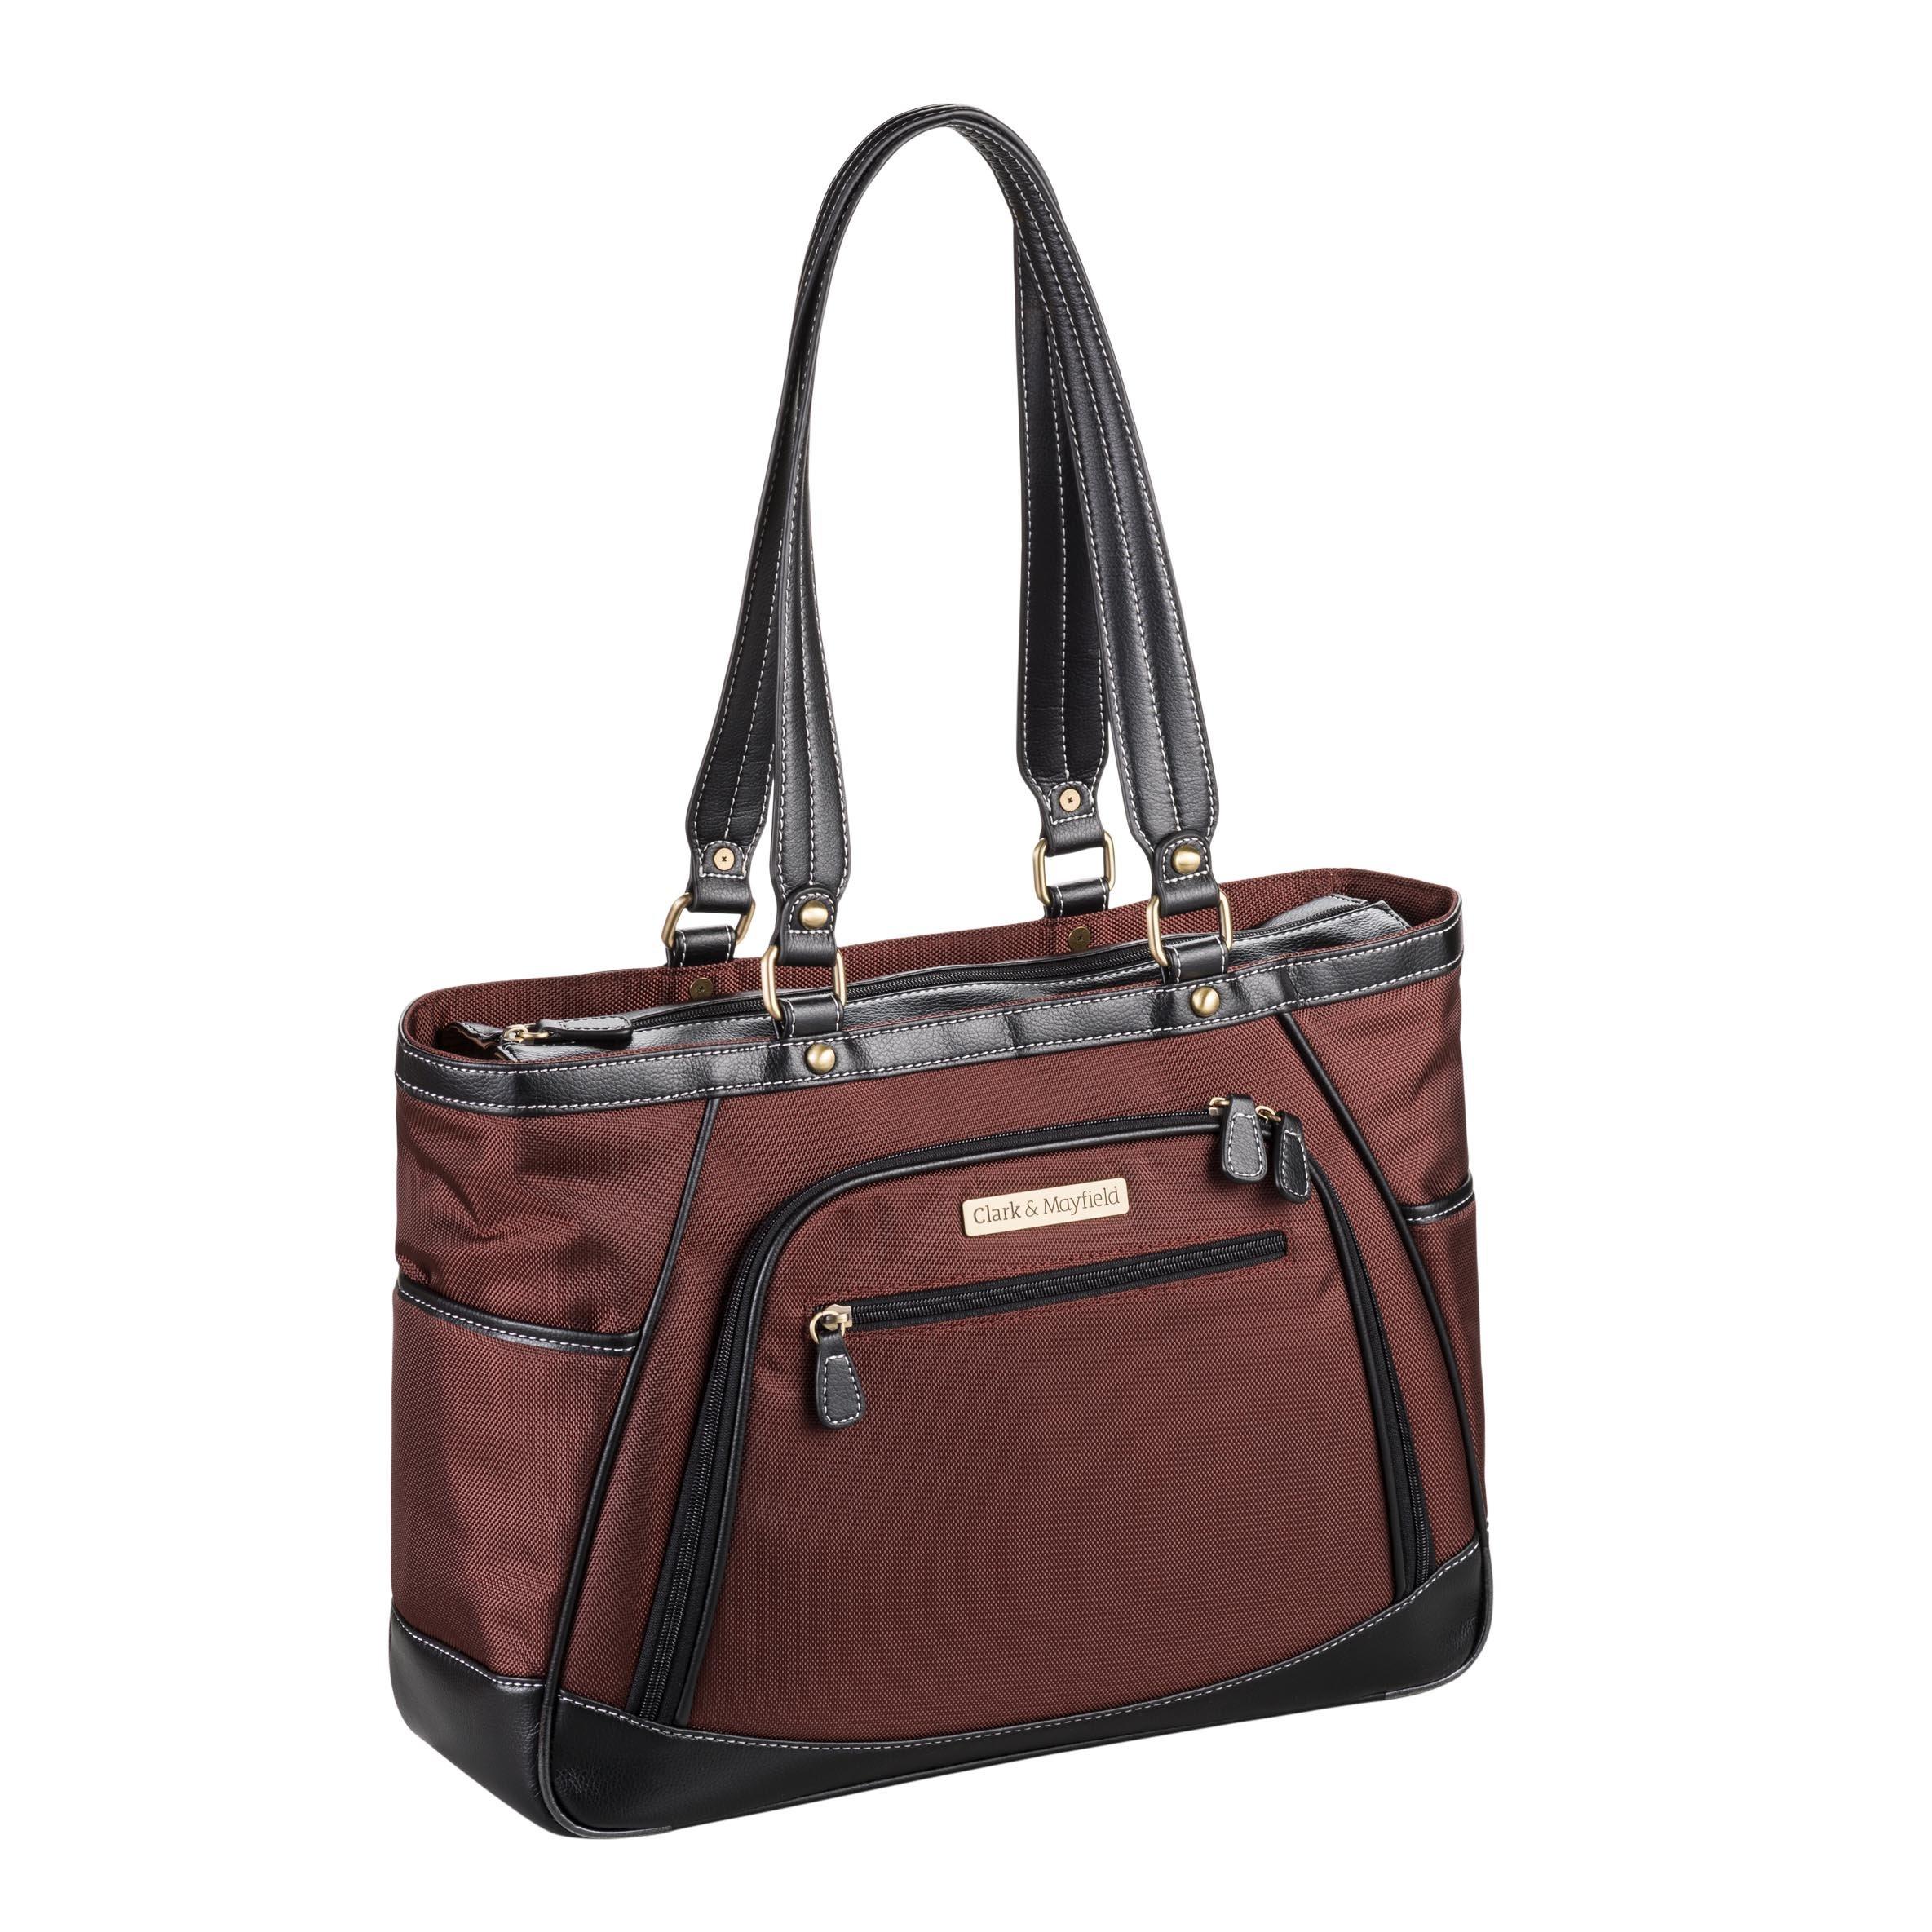 Clark & Mayfield Sellwood Metro Laptop Handbag 15.6'' (Bordeaux Brown)